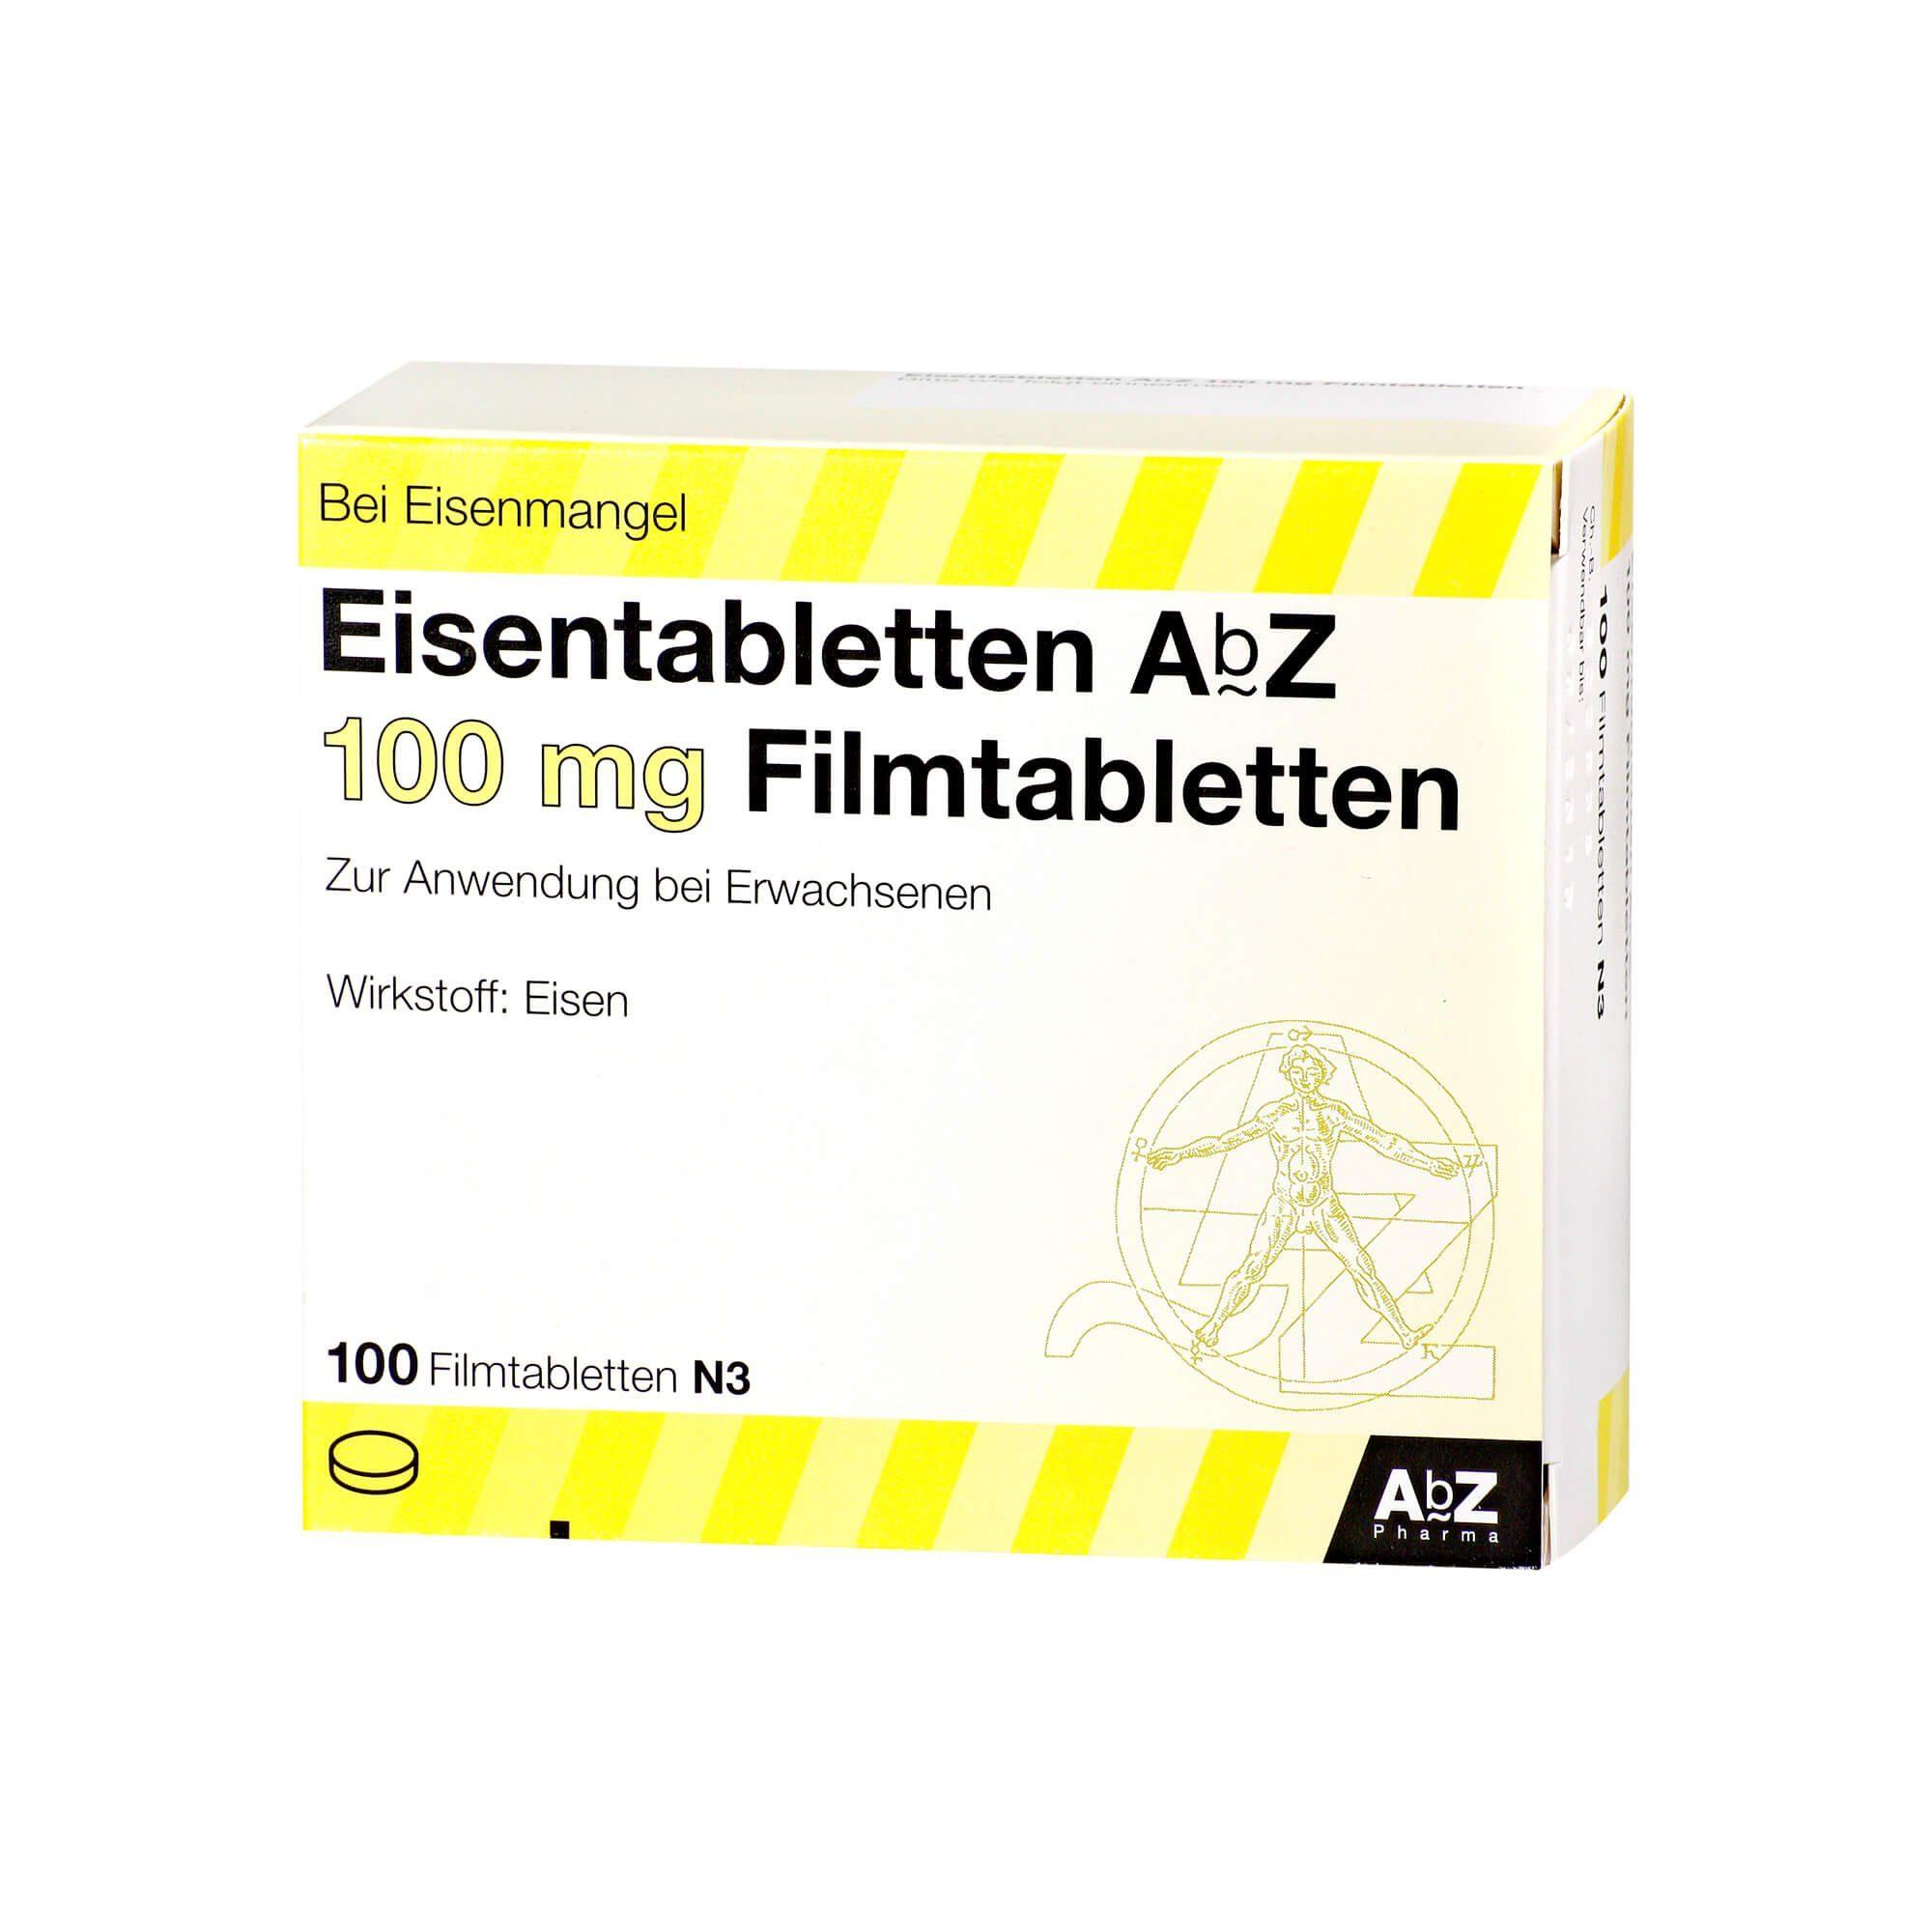 Eisentabletten AbZ 100mg (, 100 St)